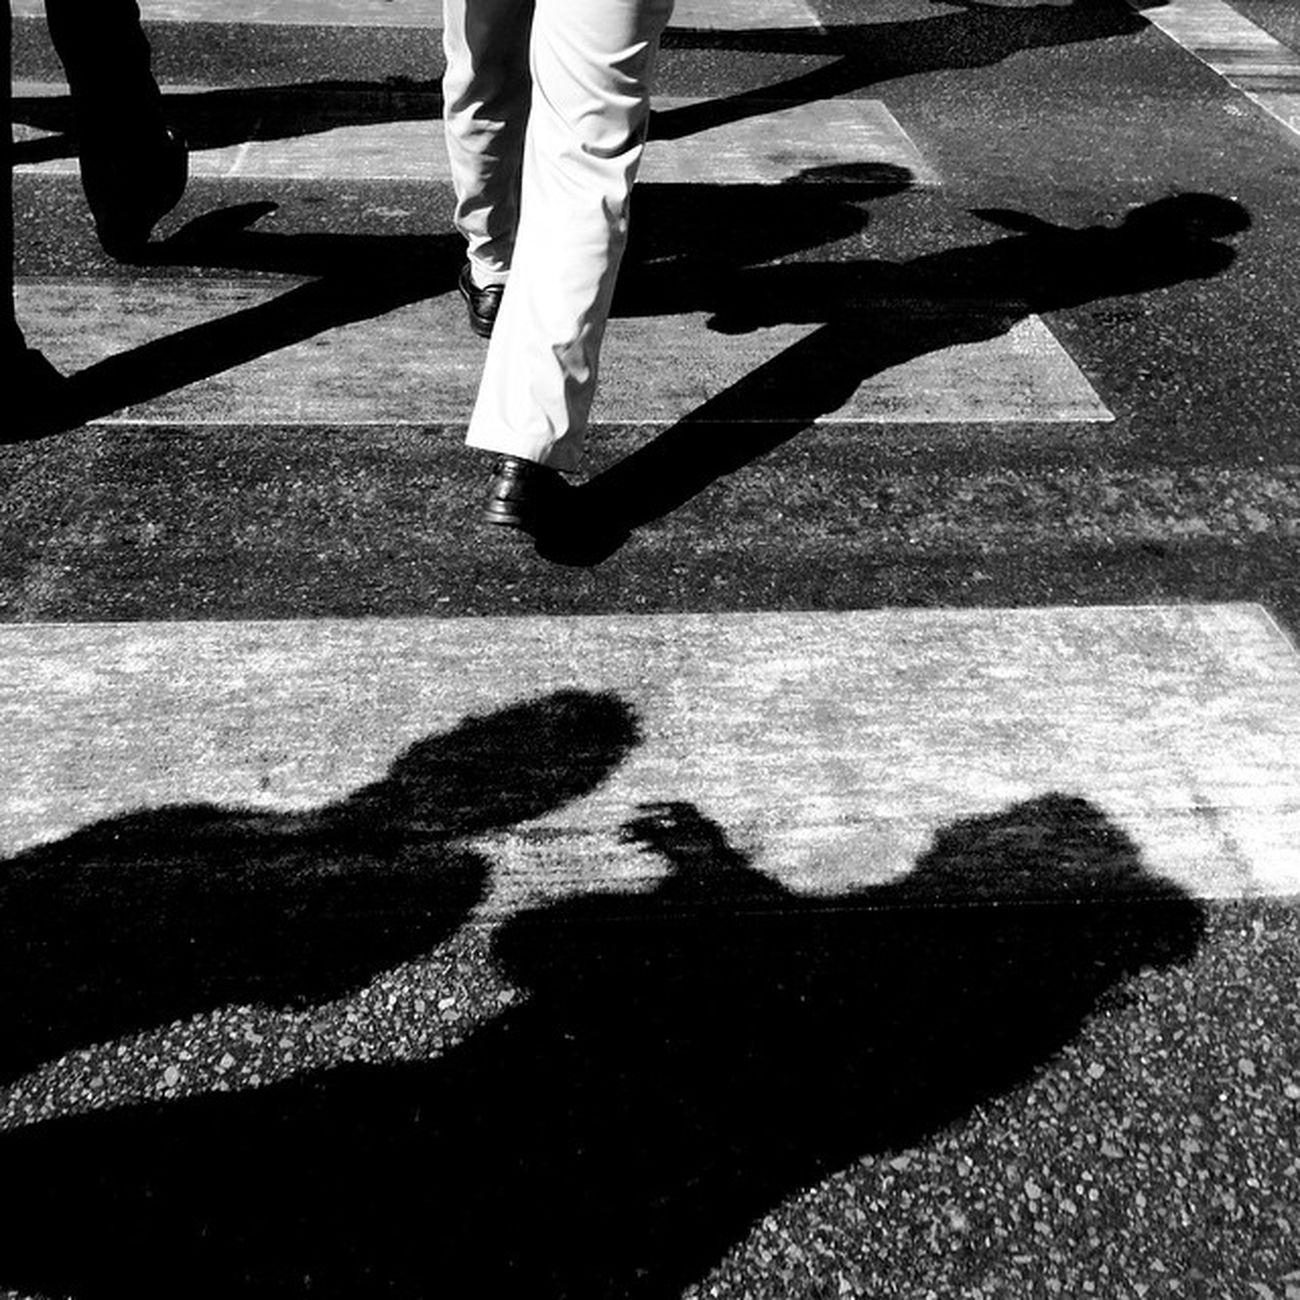 Streetphotography Exploringdubaistreet Lightandshadows Blackandwhite ShotOniPhone6 Streets_oftheworld Streetshot Streetphotography_bw Streetphotographer StreetLife_Award Mydubai StreetScenes Streets_oftheworld Dubaistreet Photoliga Photoliga_tc Shadows Pedestrian Crossing